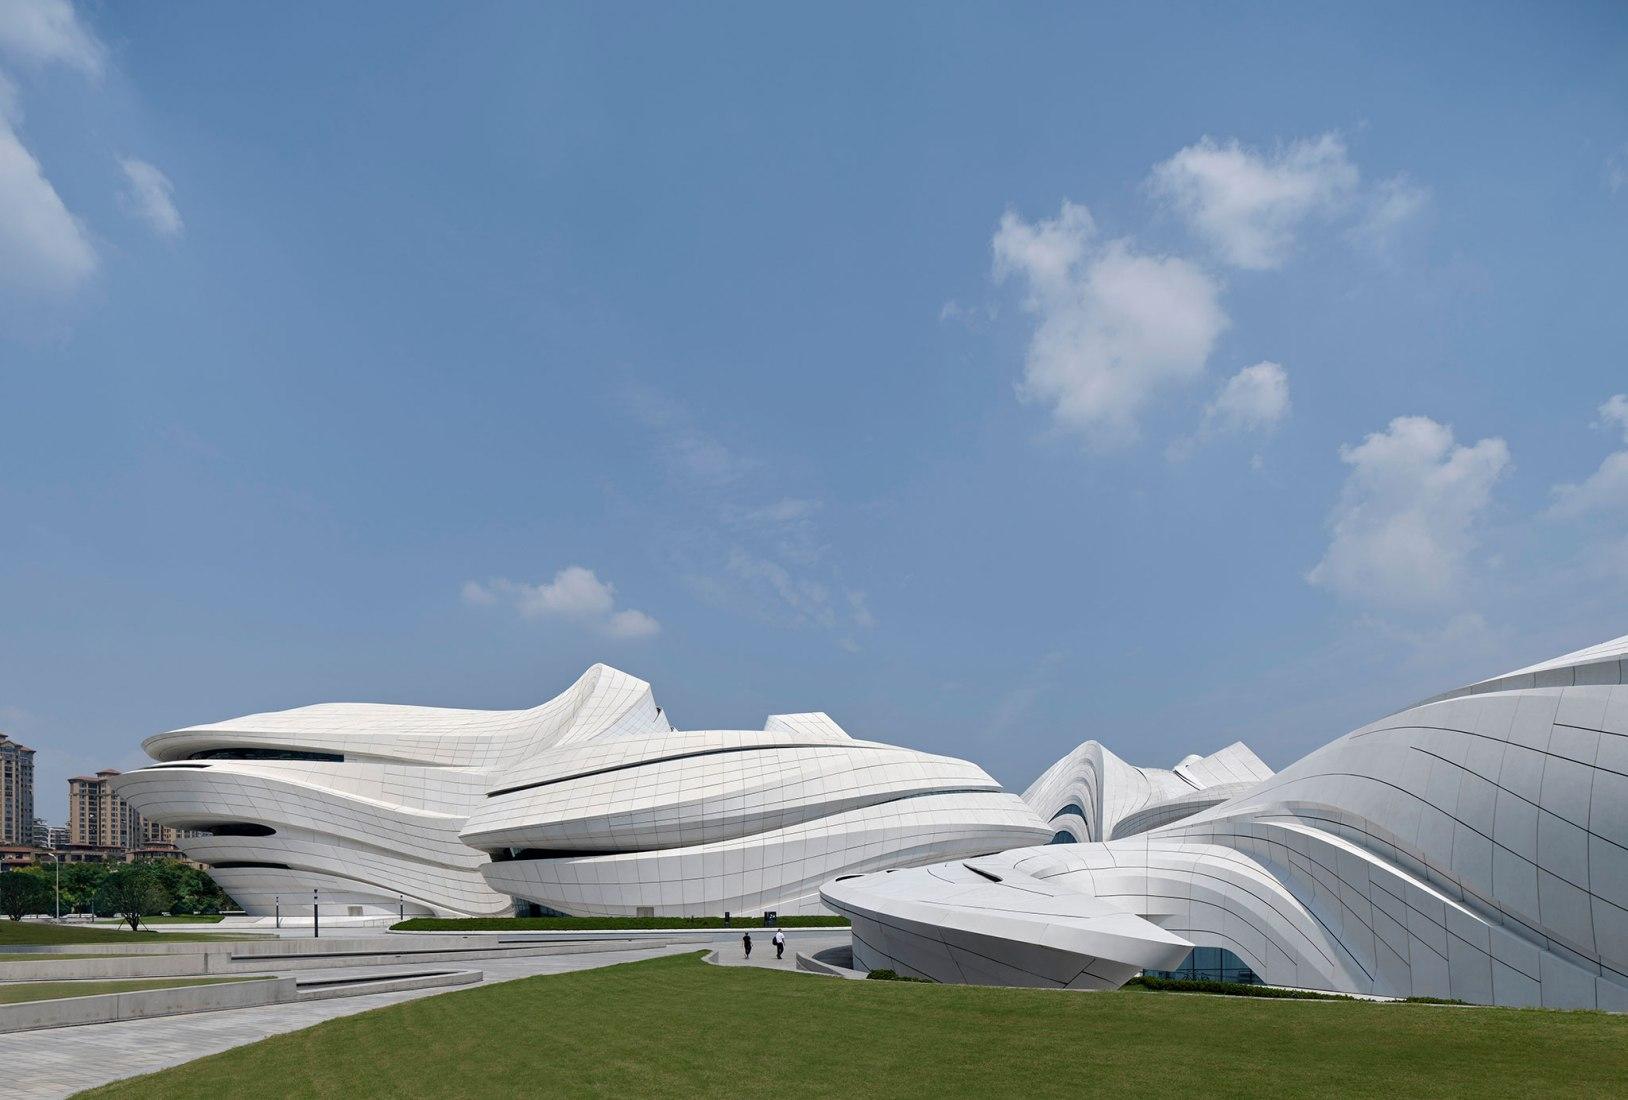 Changsha Meixihu International Culture and Art Centre by Zaha Hadid Architects. Photograph by Virgile Simon Bertrand